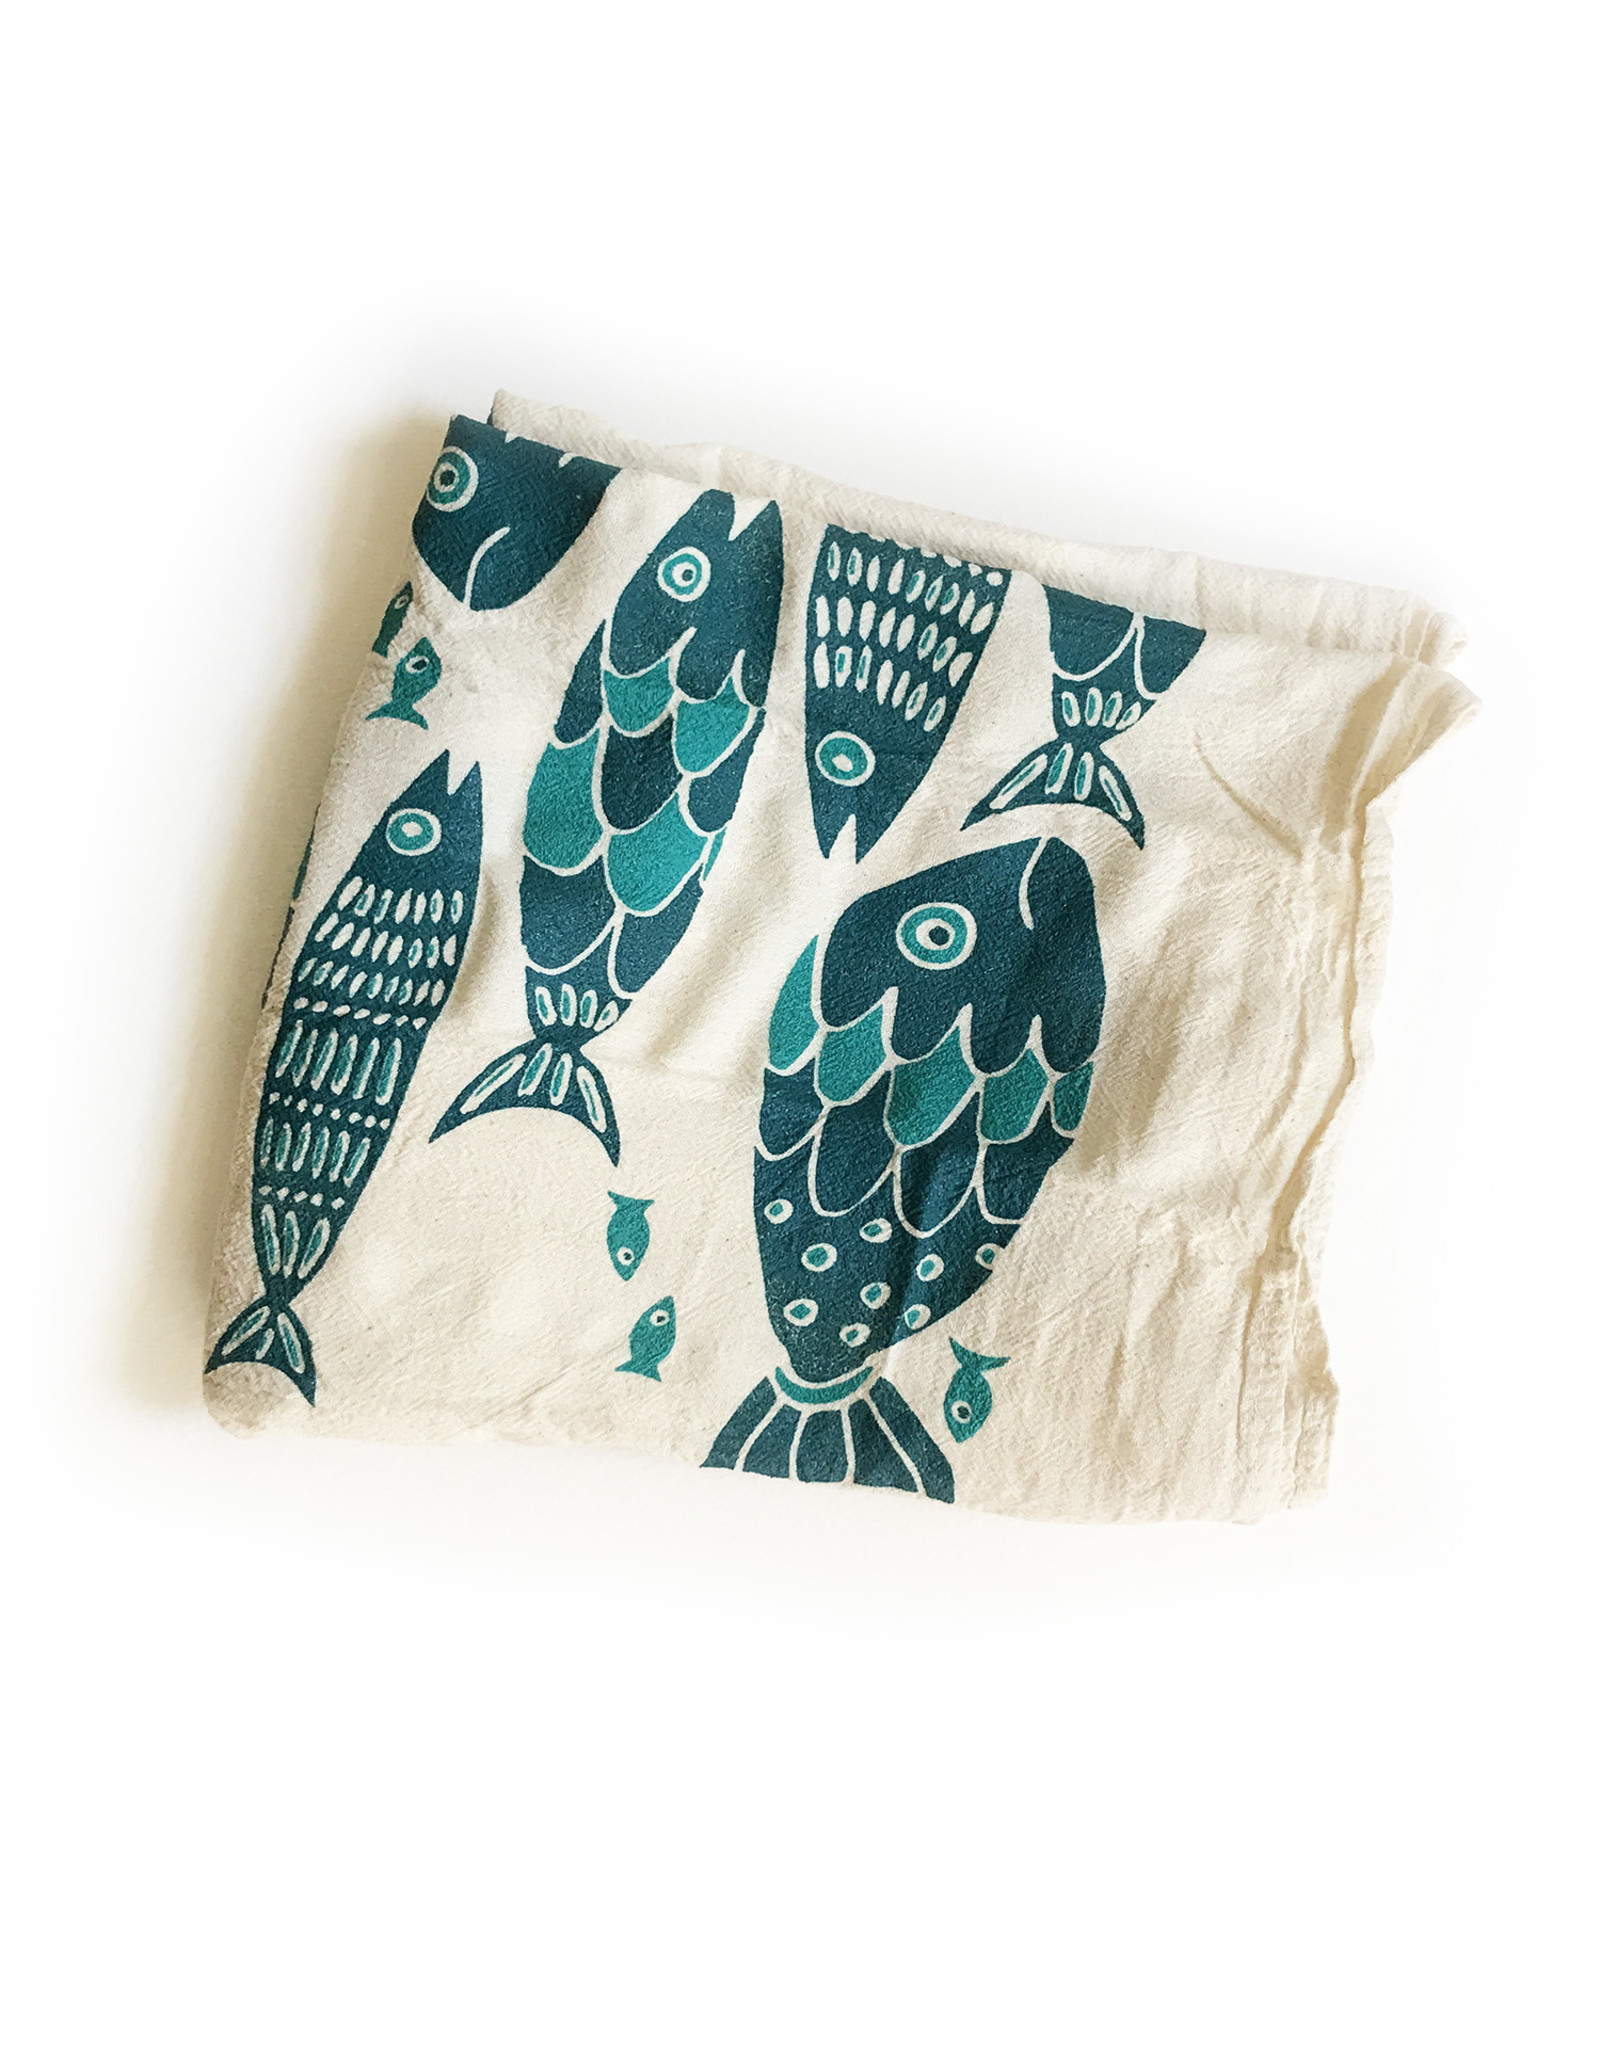 Noon Noon Flour Sack Tea Towels